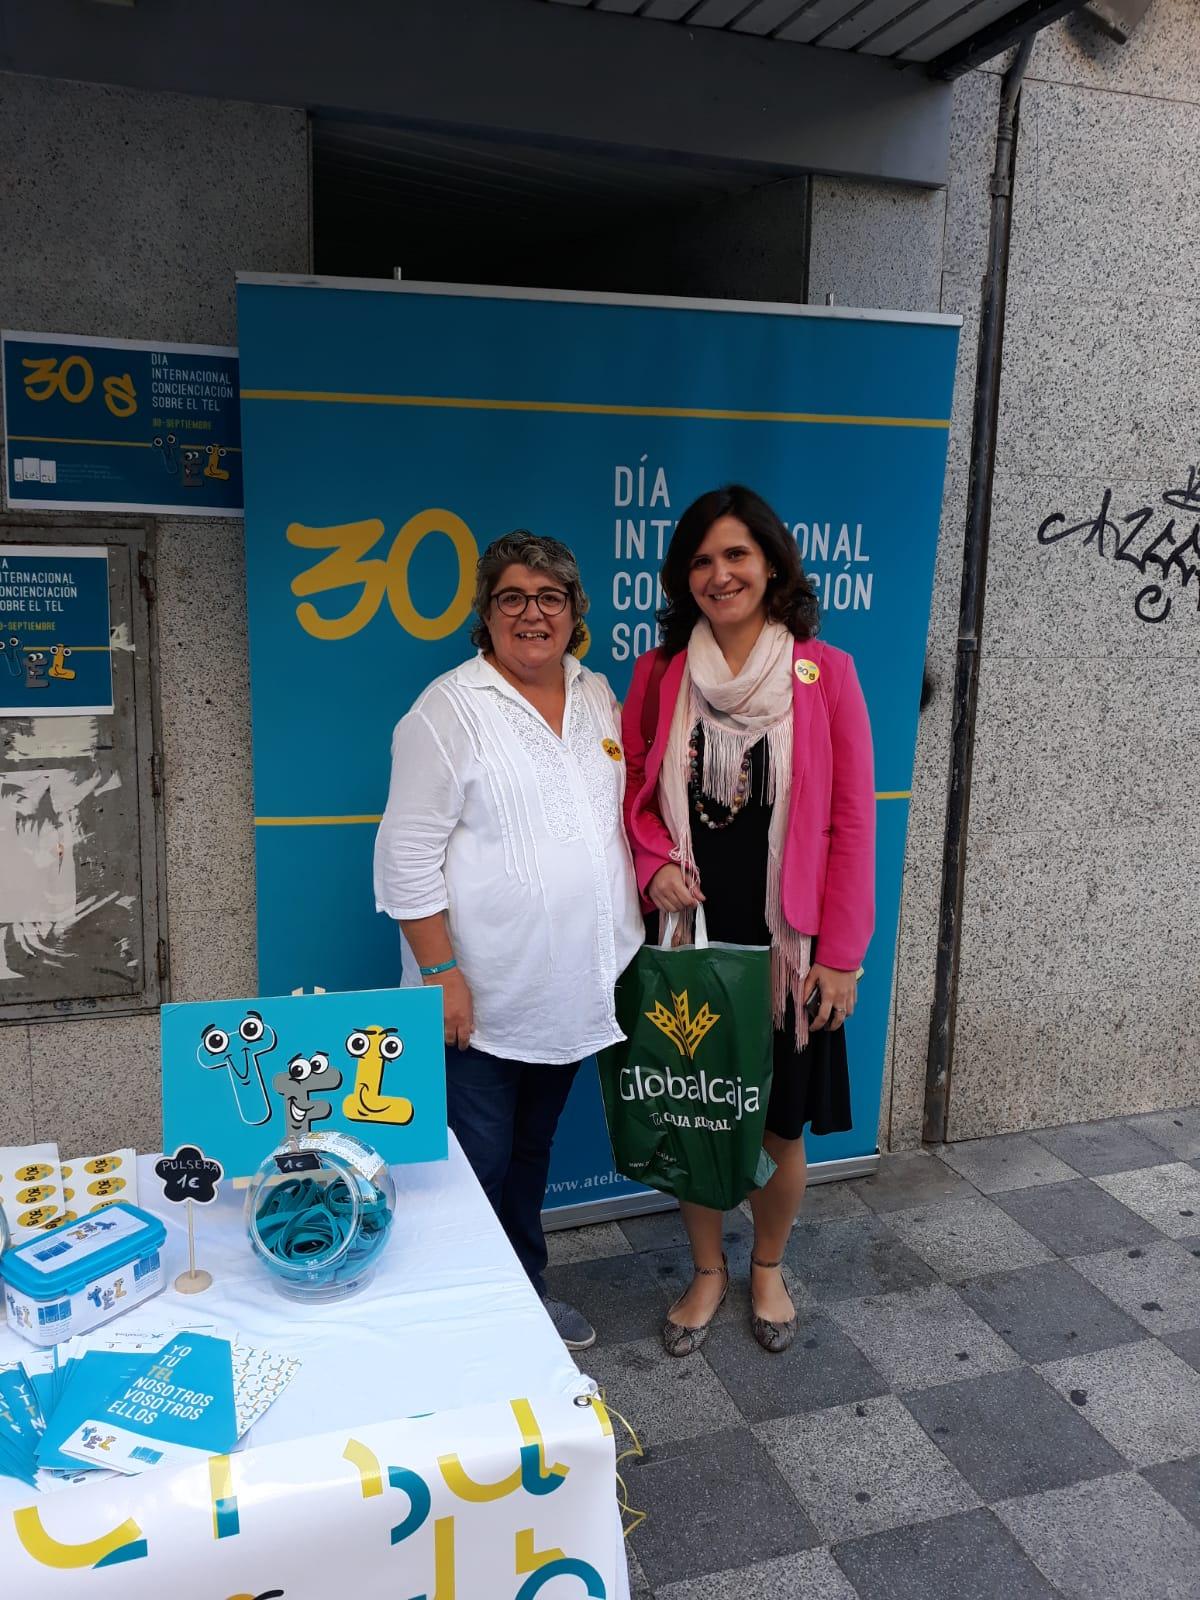 https://blog.globalcaja.es/wp-content/uploads/2018/10/IMG-20180928-WA0004.jpg